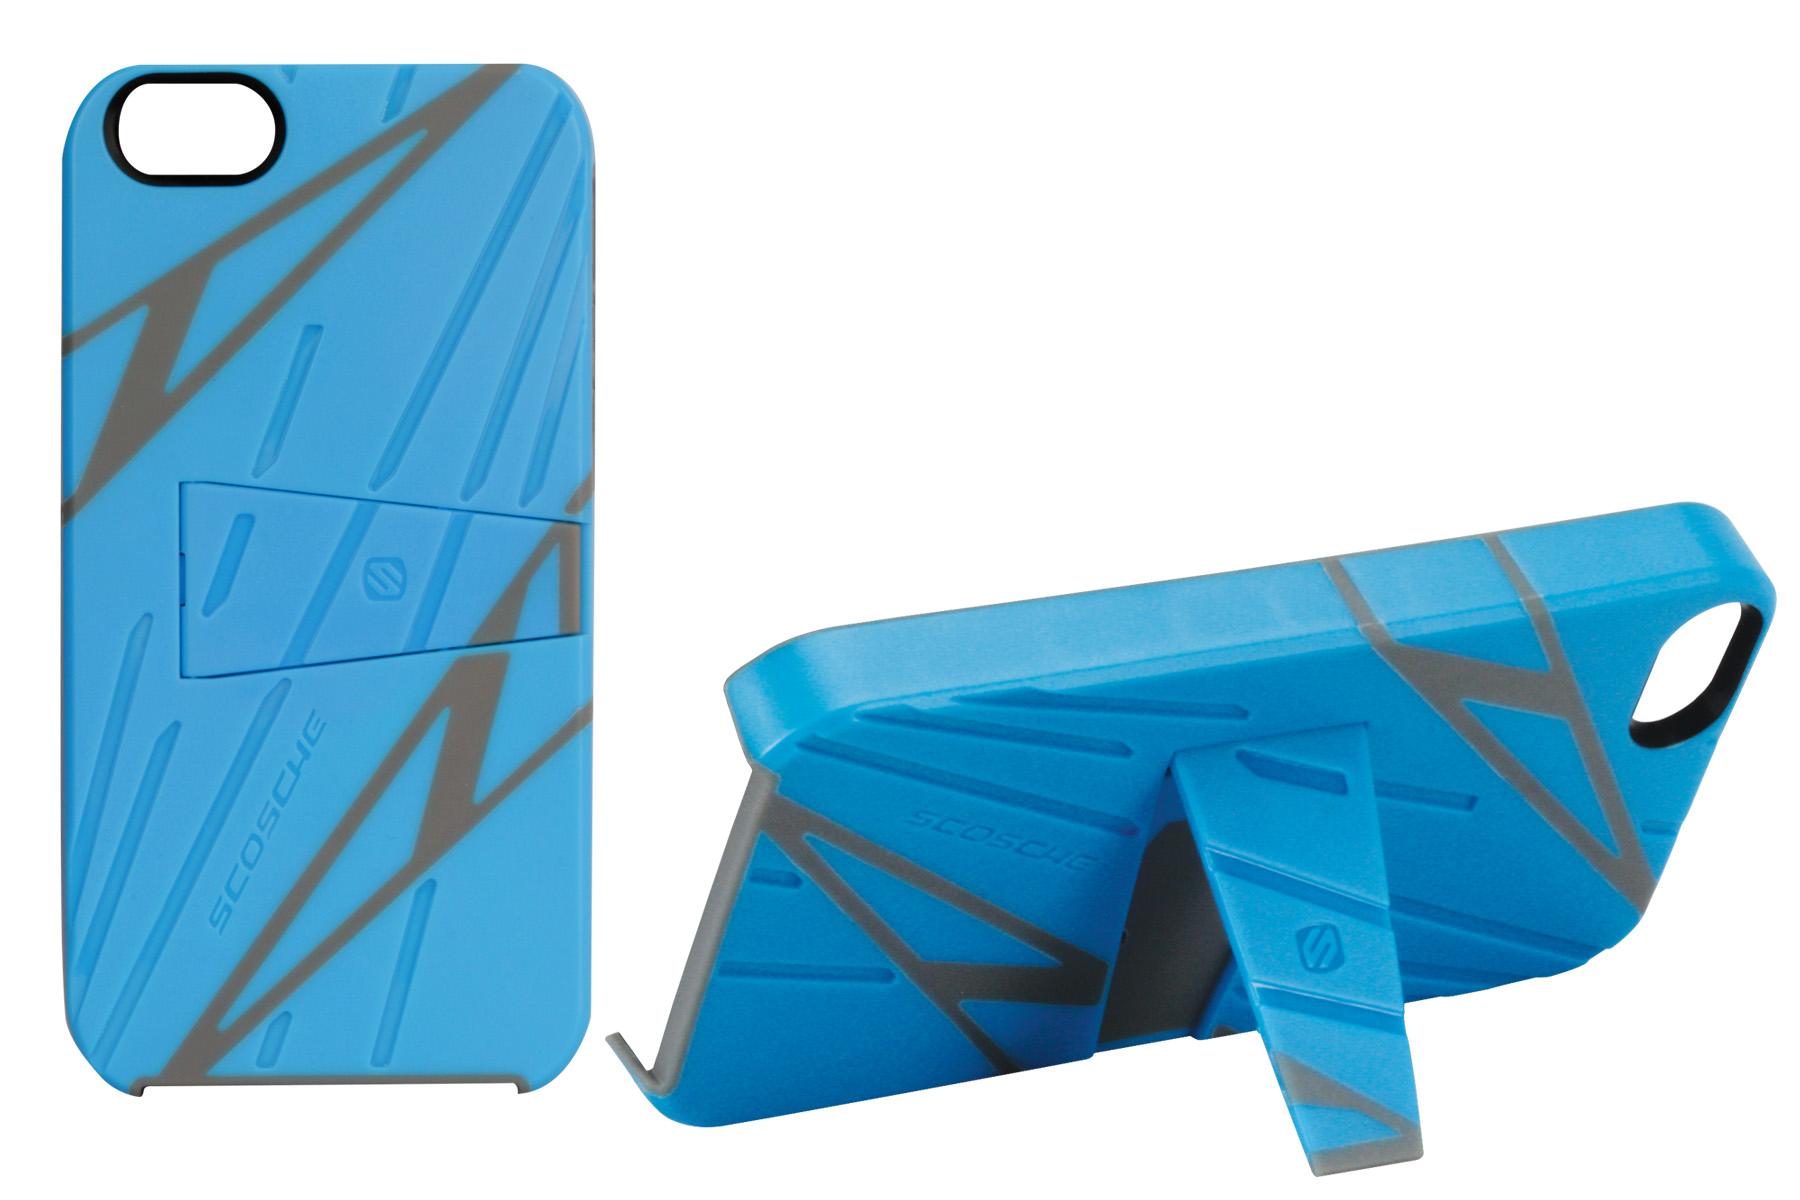 iphone case IP5SPBL_all_4x6